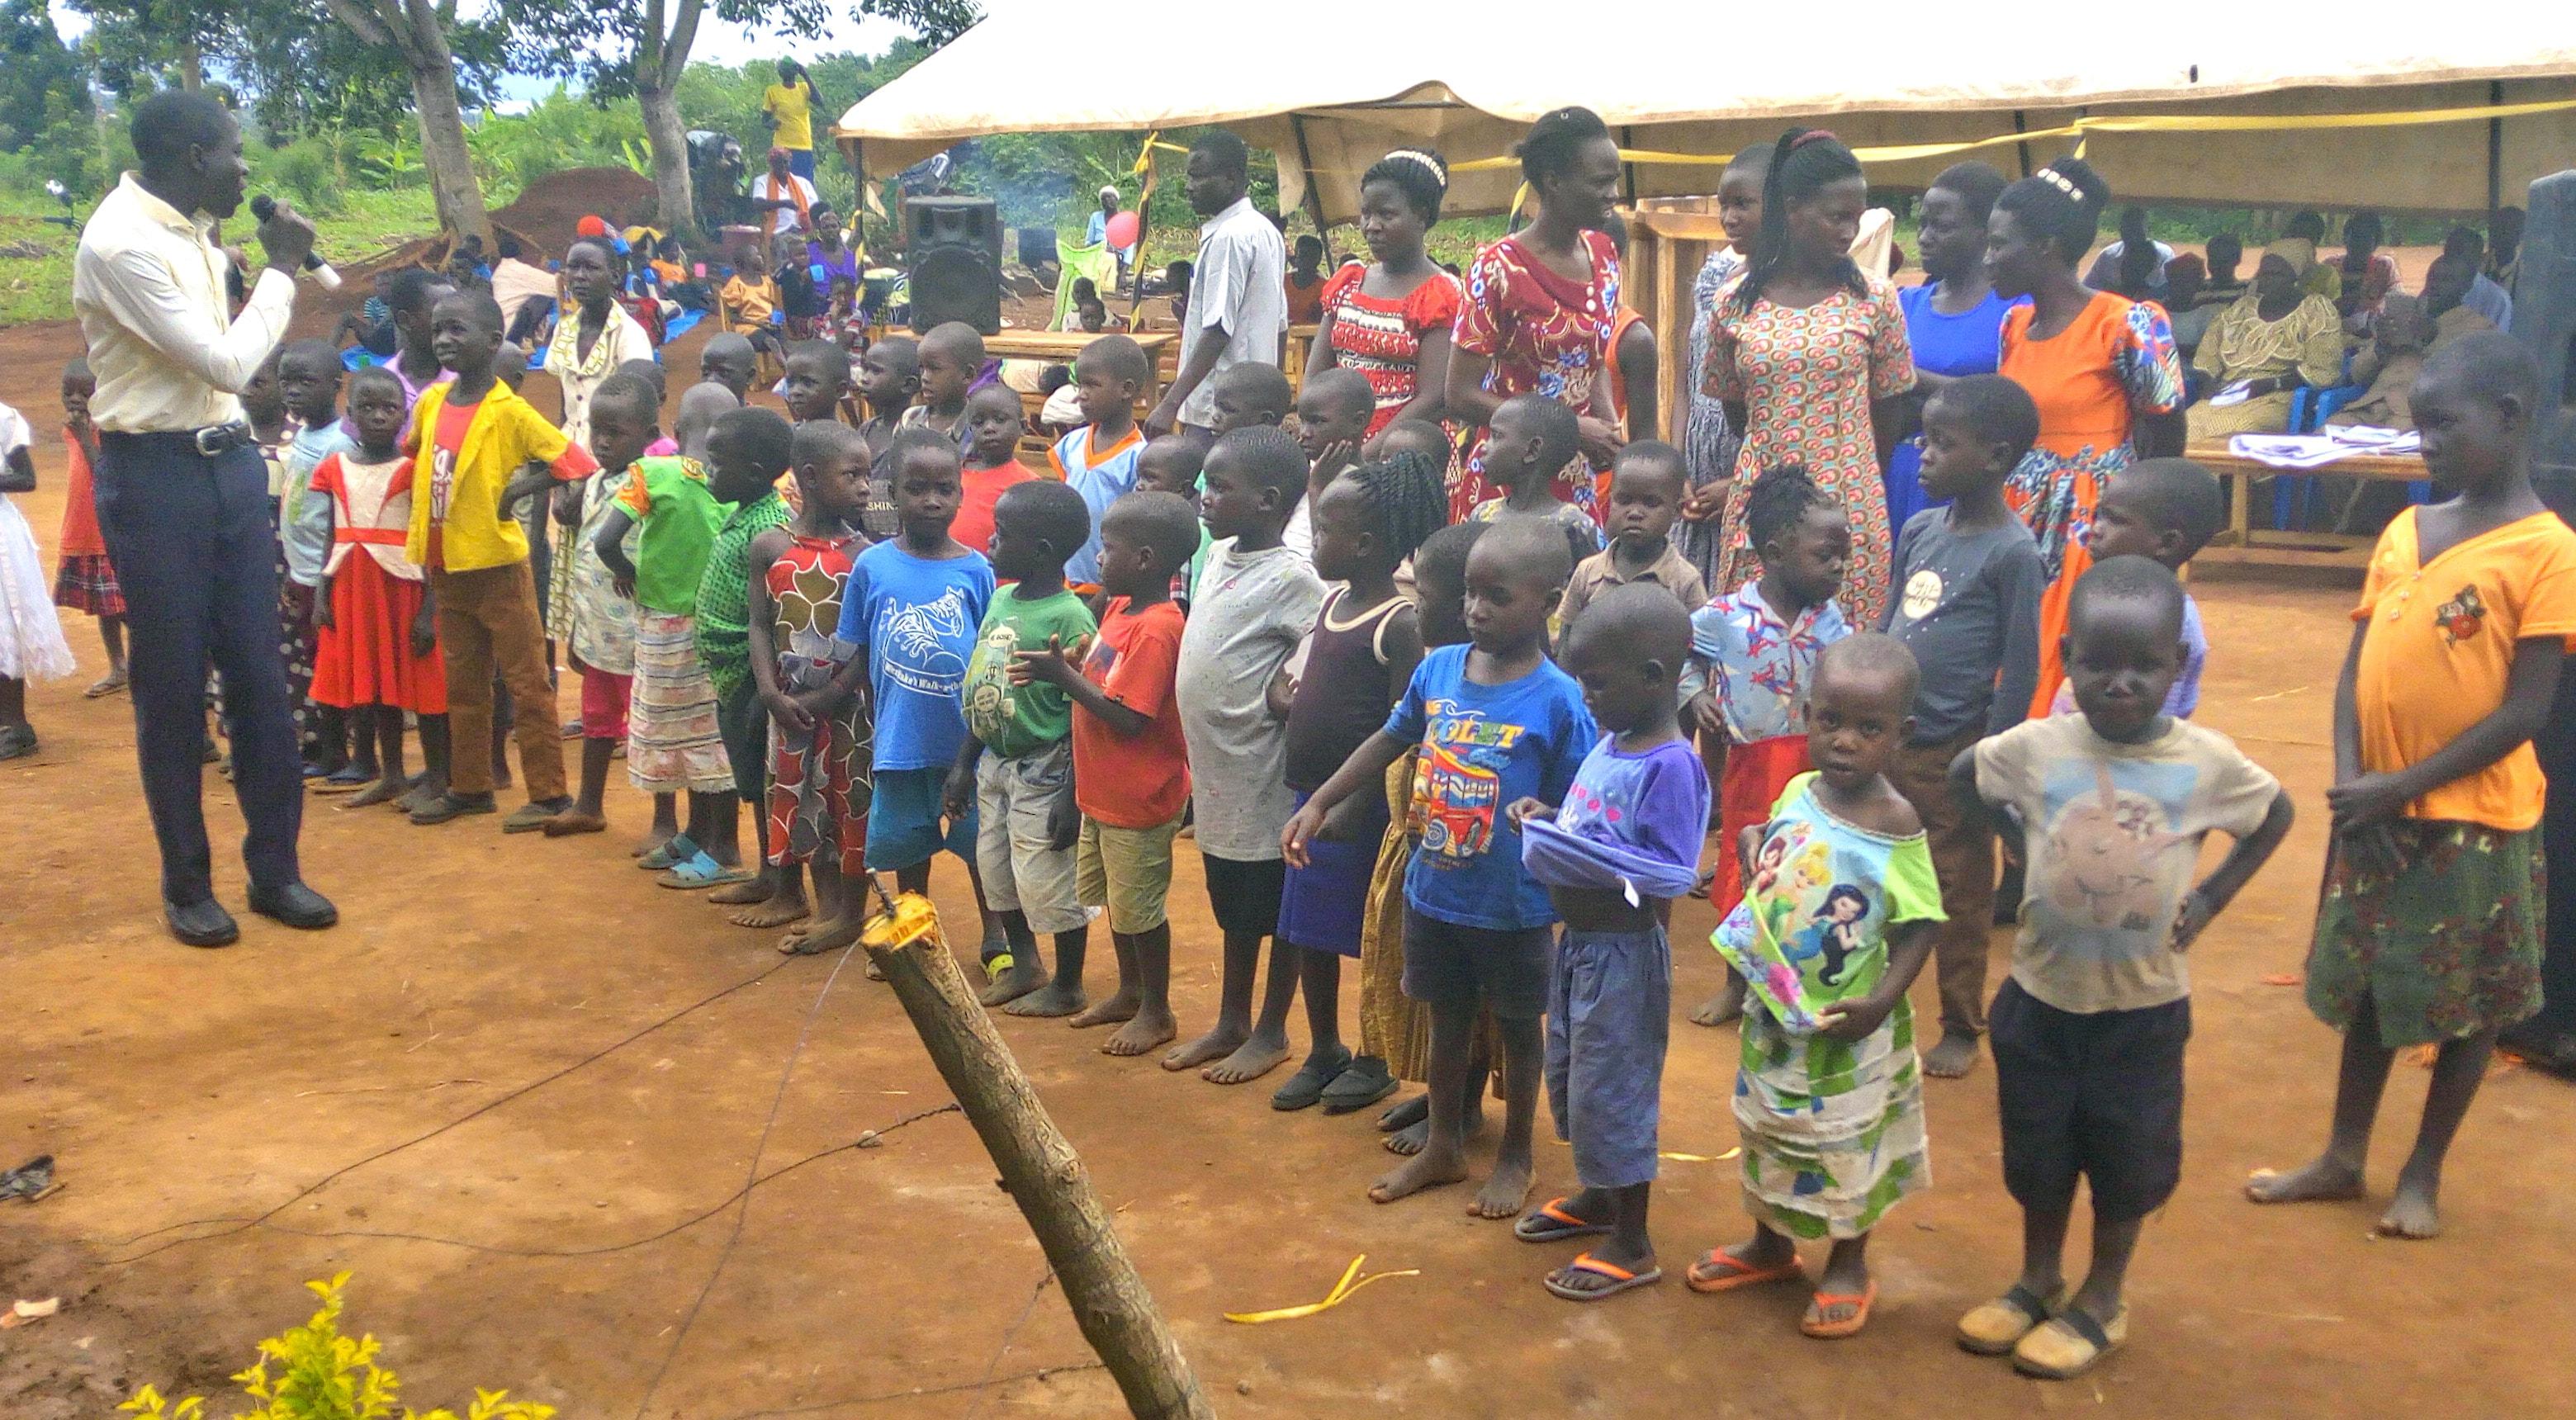 Children ages 3-7 attend the new Magooli Academy for Children in Lugala, Uganda. United Methodist deacon Joseph Zalambi of Grace United Methodist Church-Magooli opened the preschool to help orphaned and vulnerable children. Photo by Vivian Agaba, UM News.